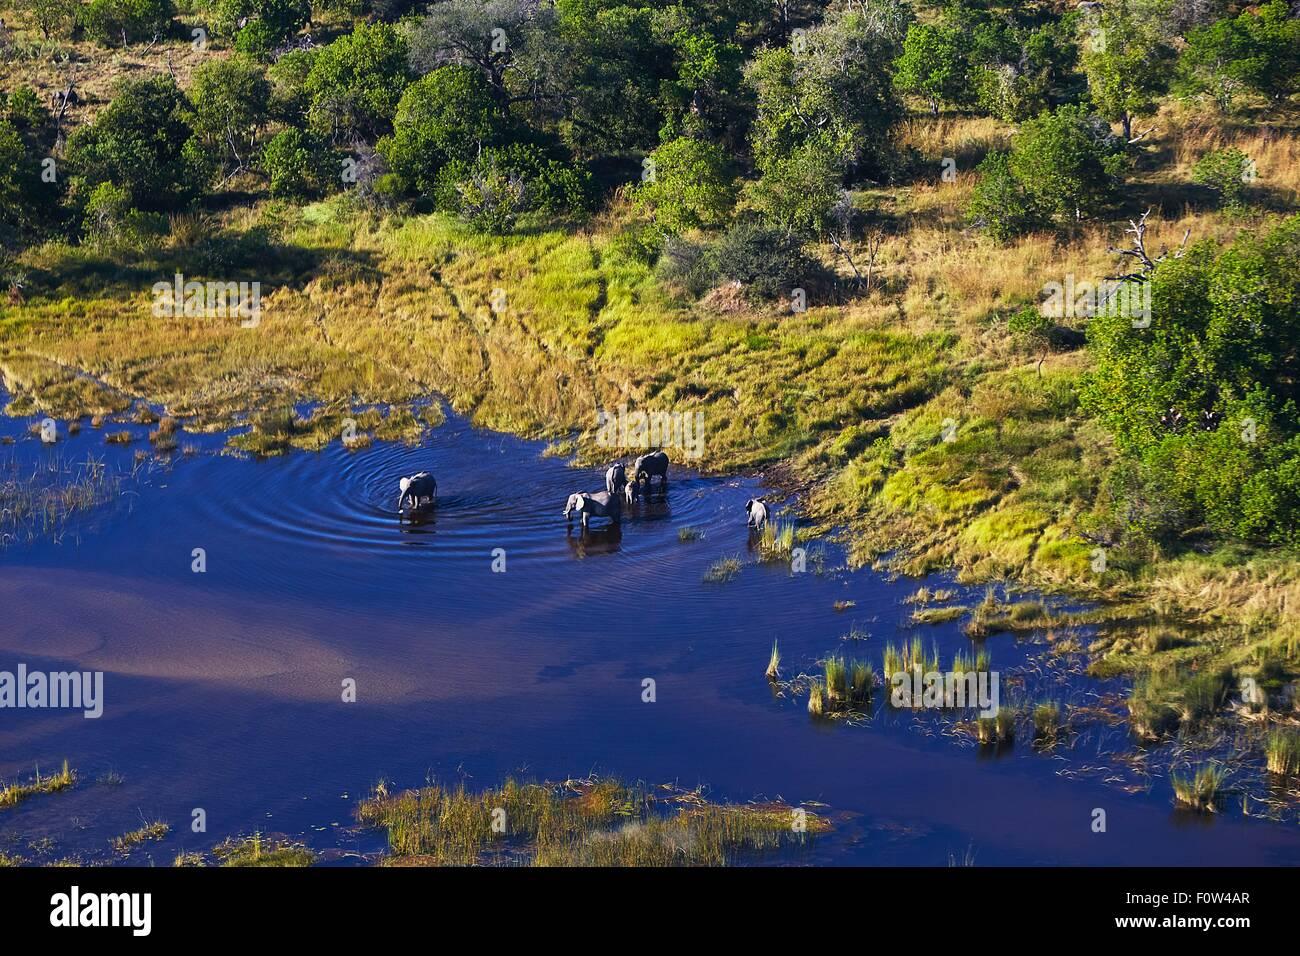 Aerial view of elephants, Maun, Okavango Delta, Botswana, Africa - Stock Image